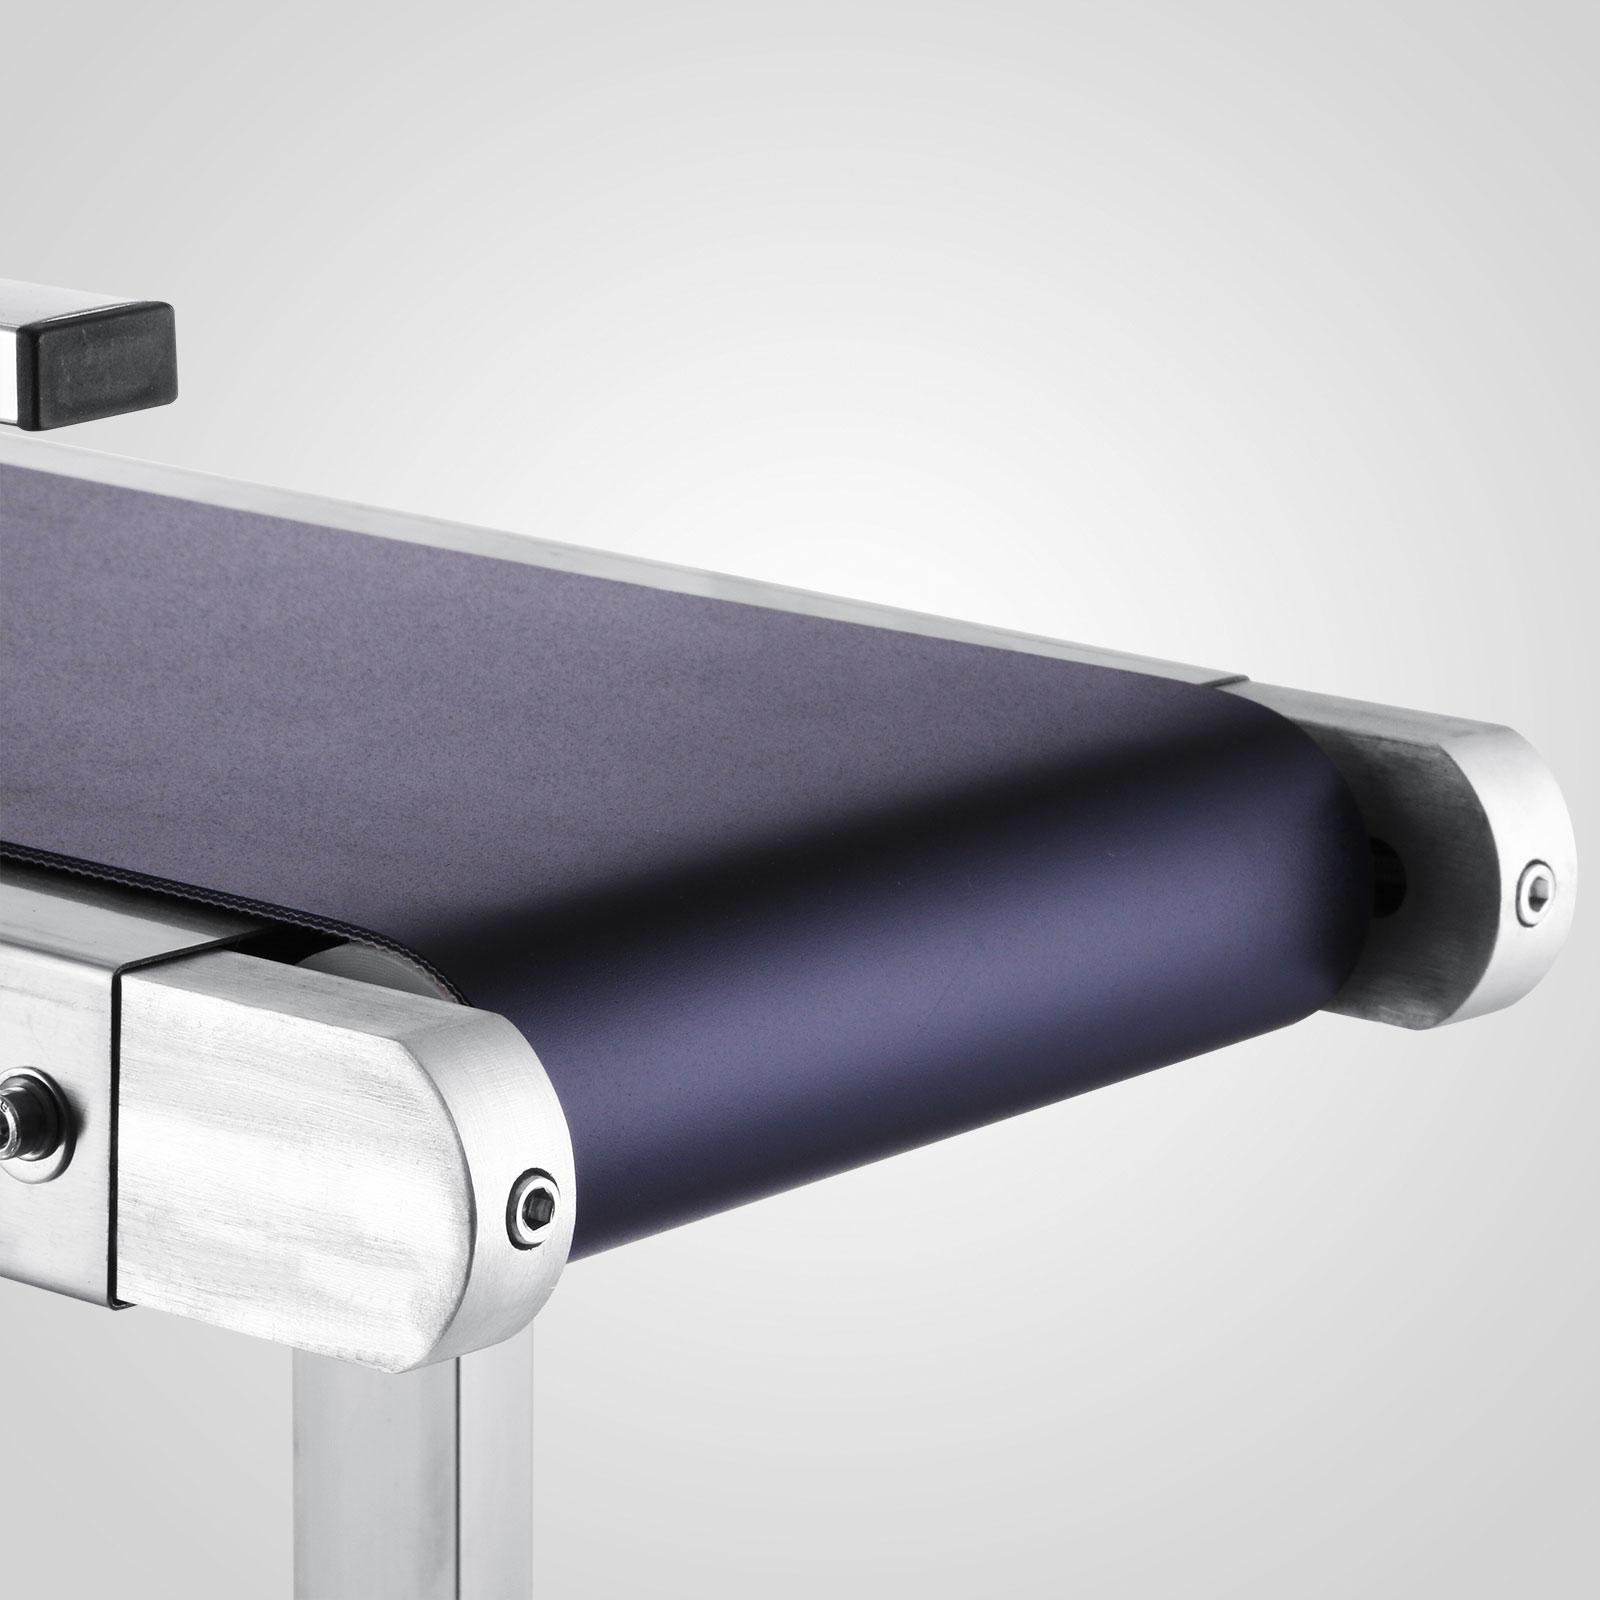 Einzel Zaun Förderband 1500x200mm Transportband Bandförderer Elektrisch 1.5m